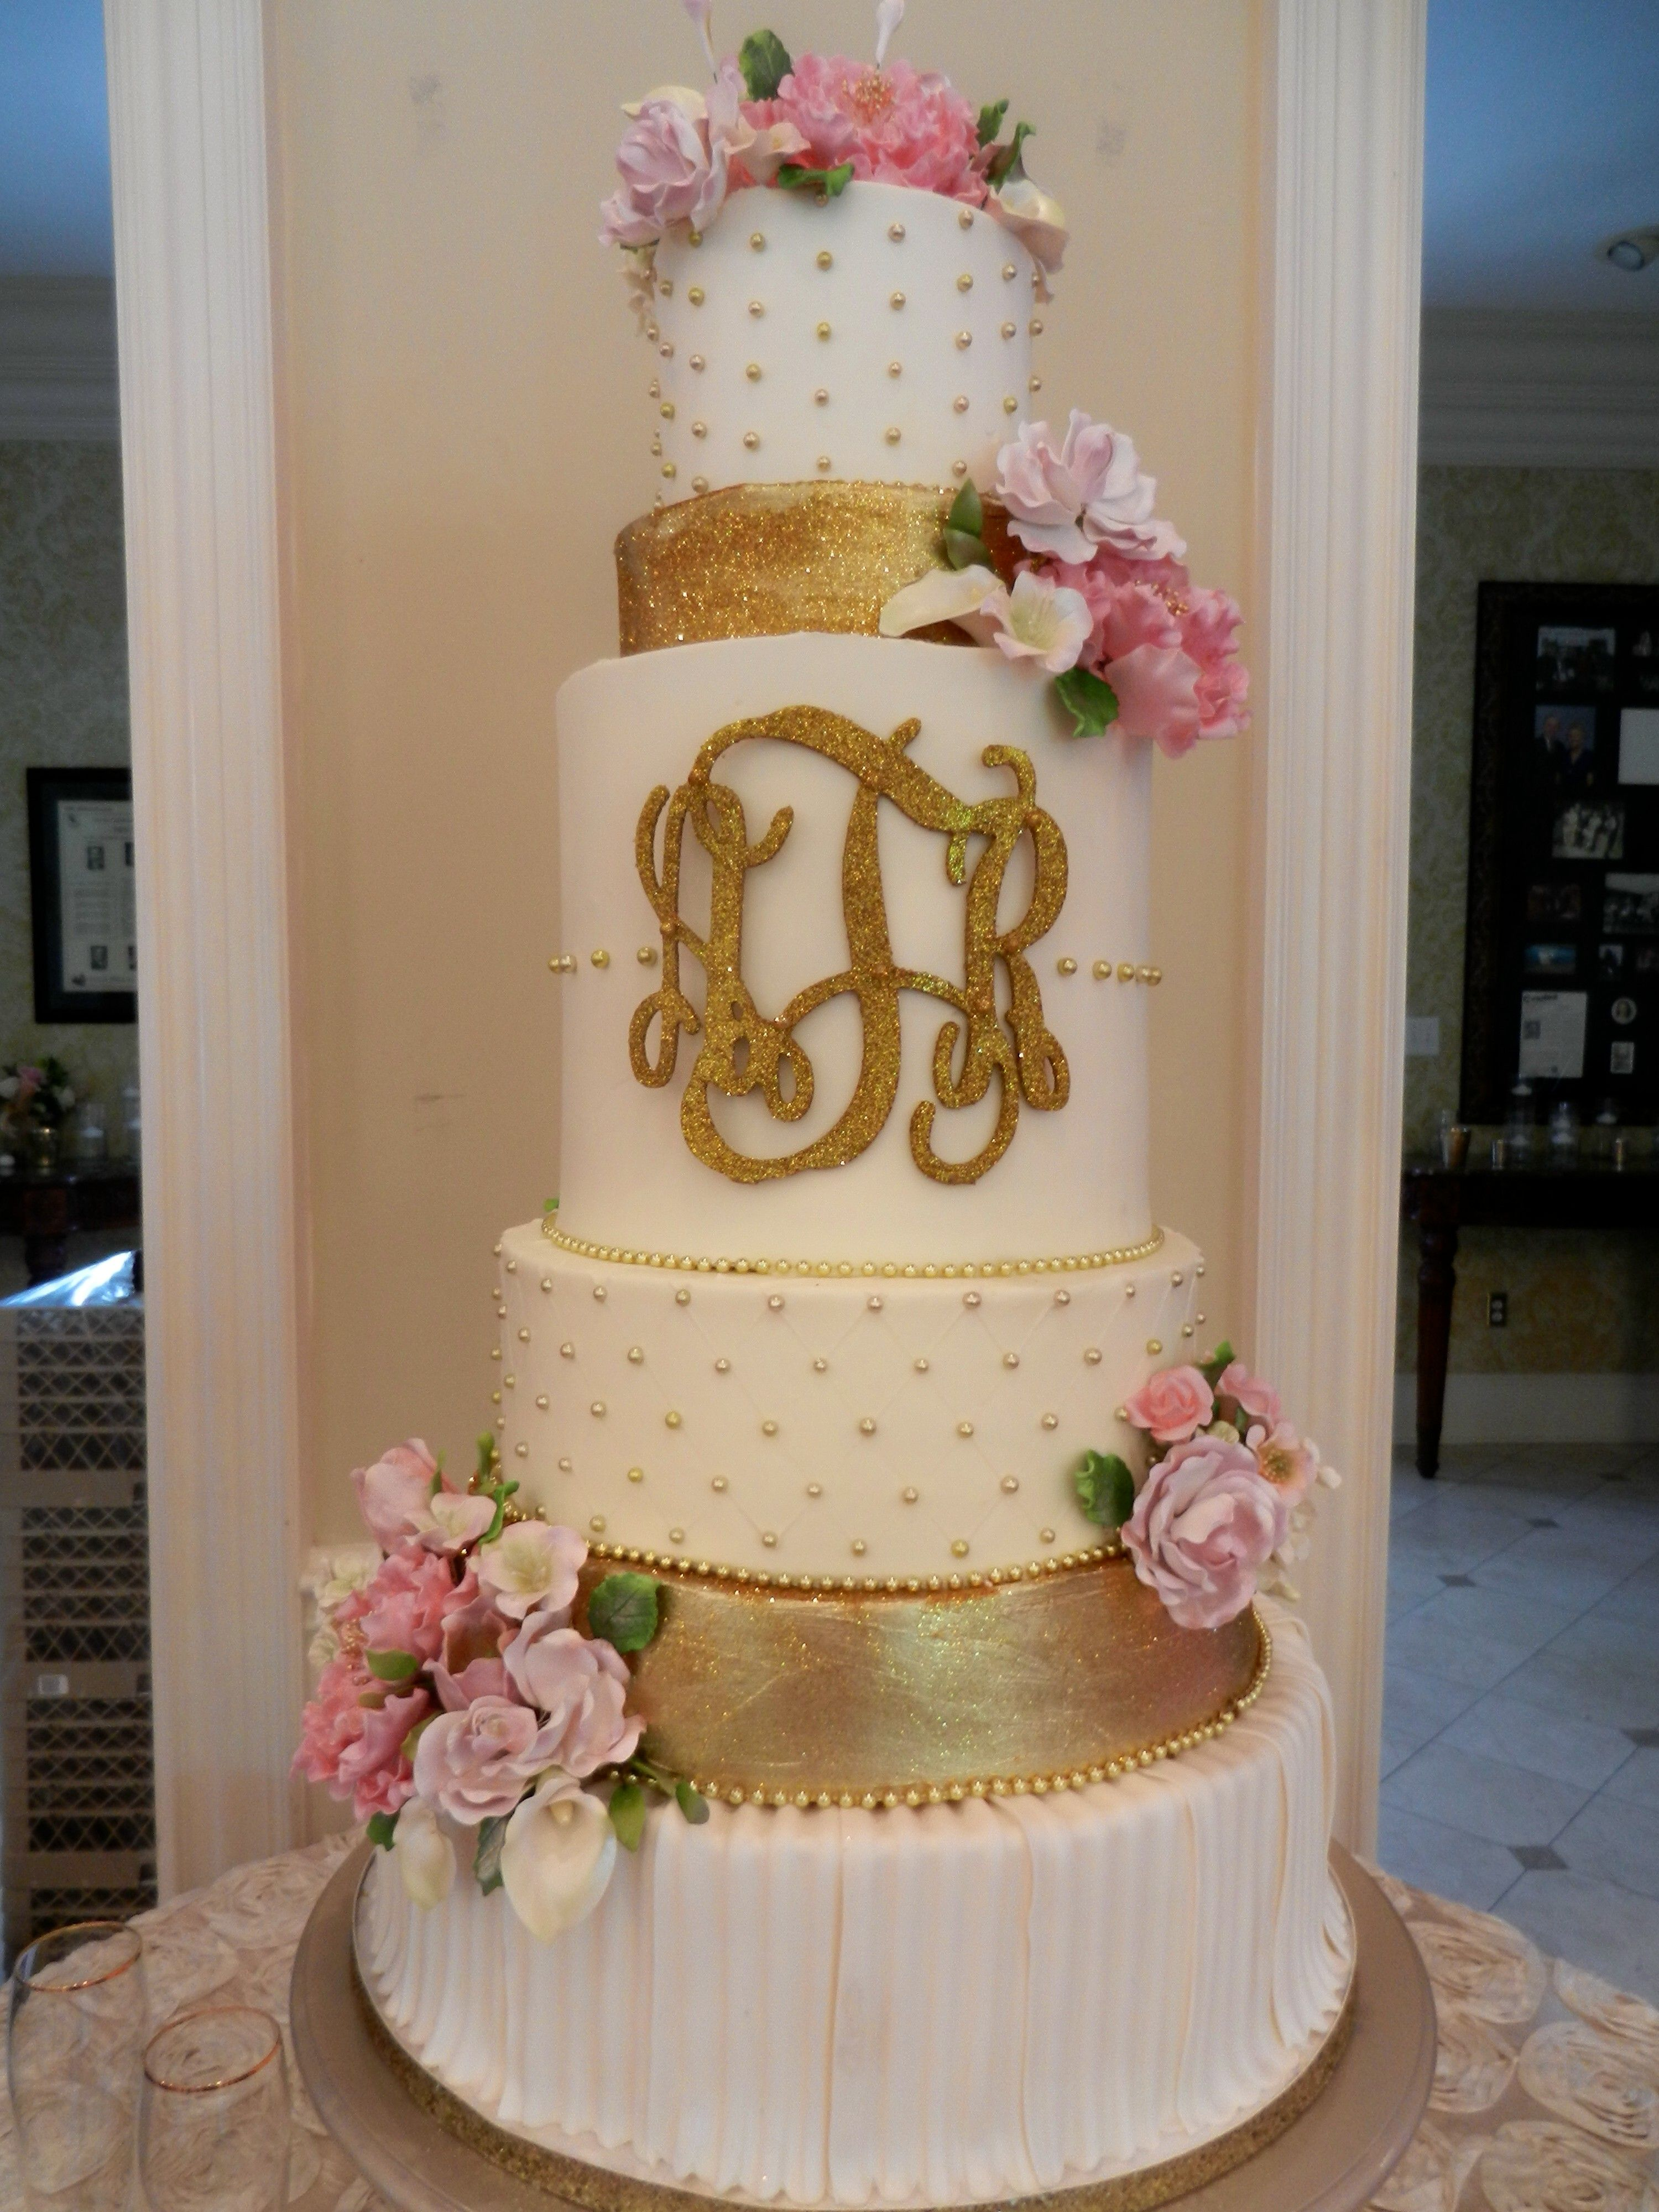 Gold Monogram Wedding Cake Www.cheesecakeetc.biz Wedding Cakes Charlotte NC